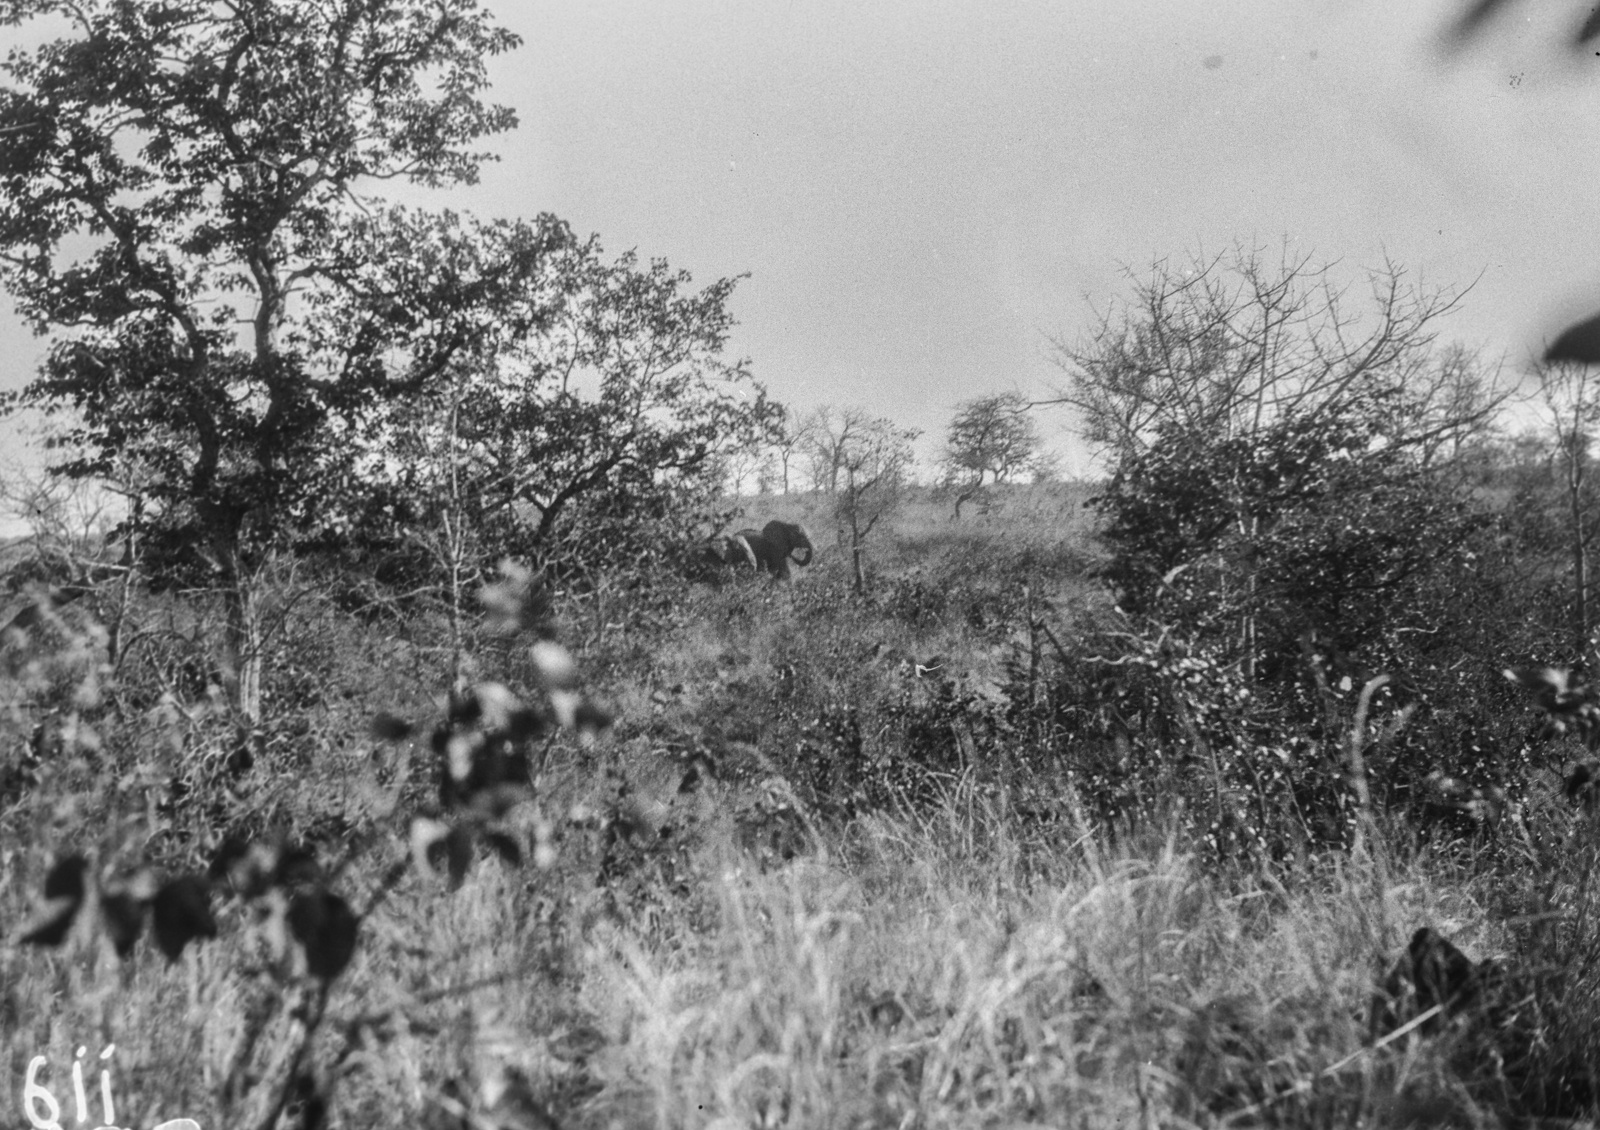 Национальный парк Крюгера. Слоны в национальном парке